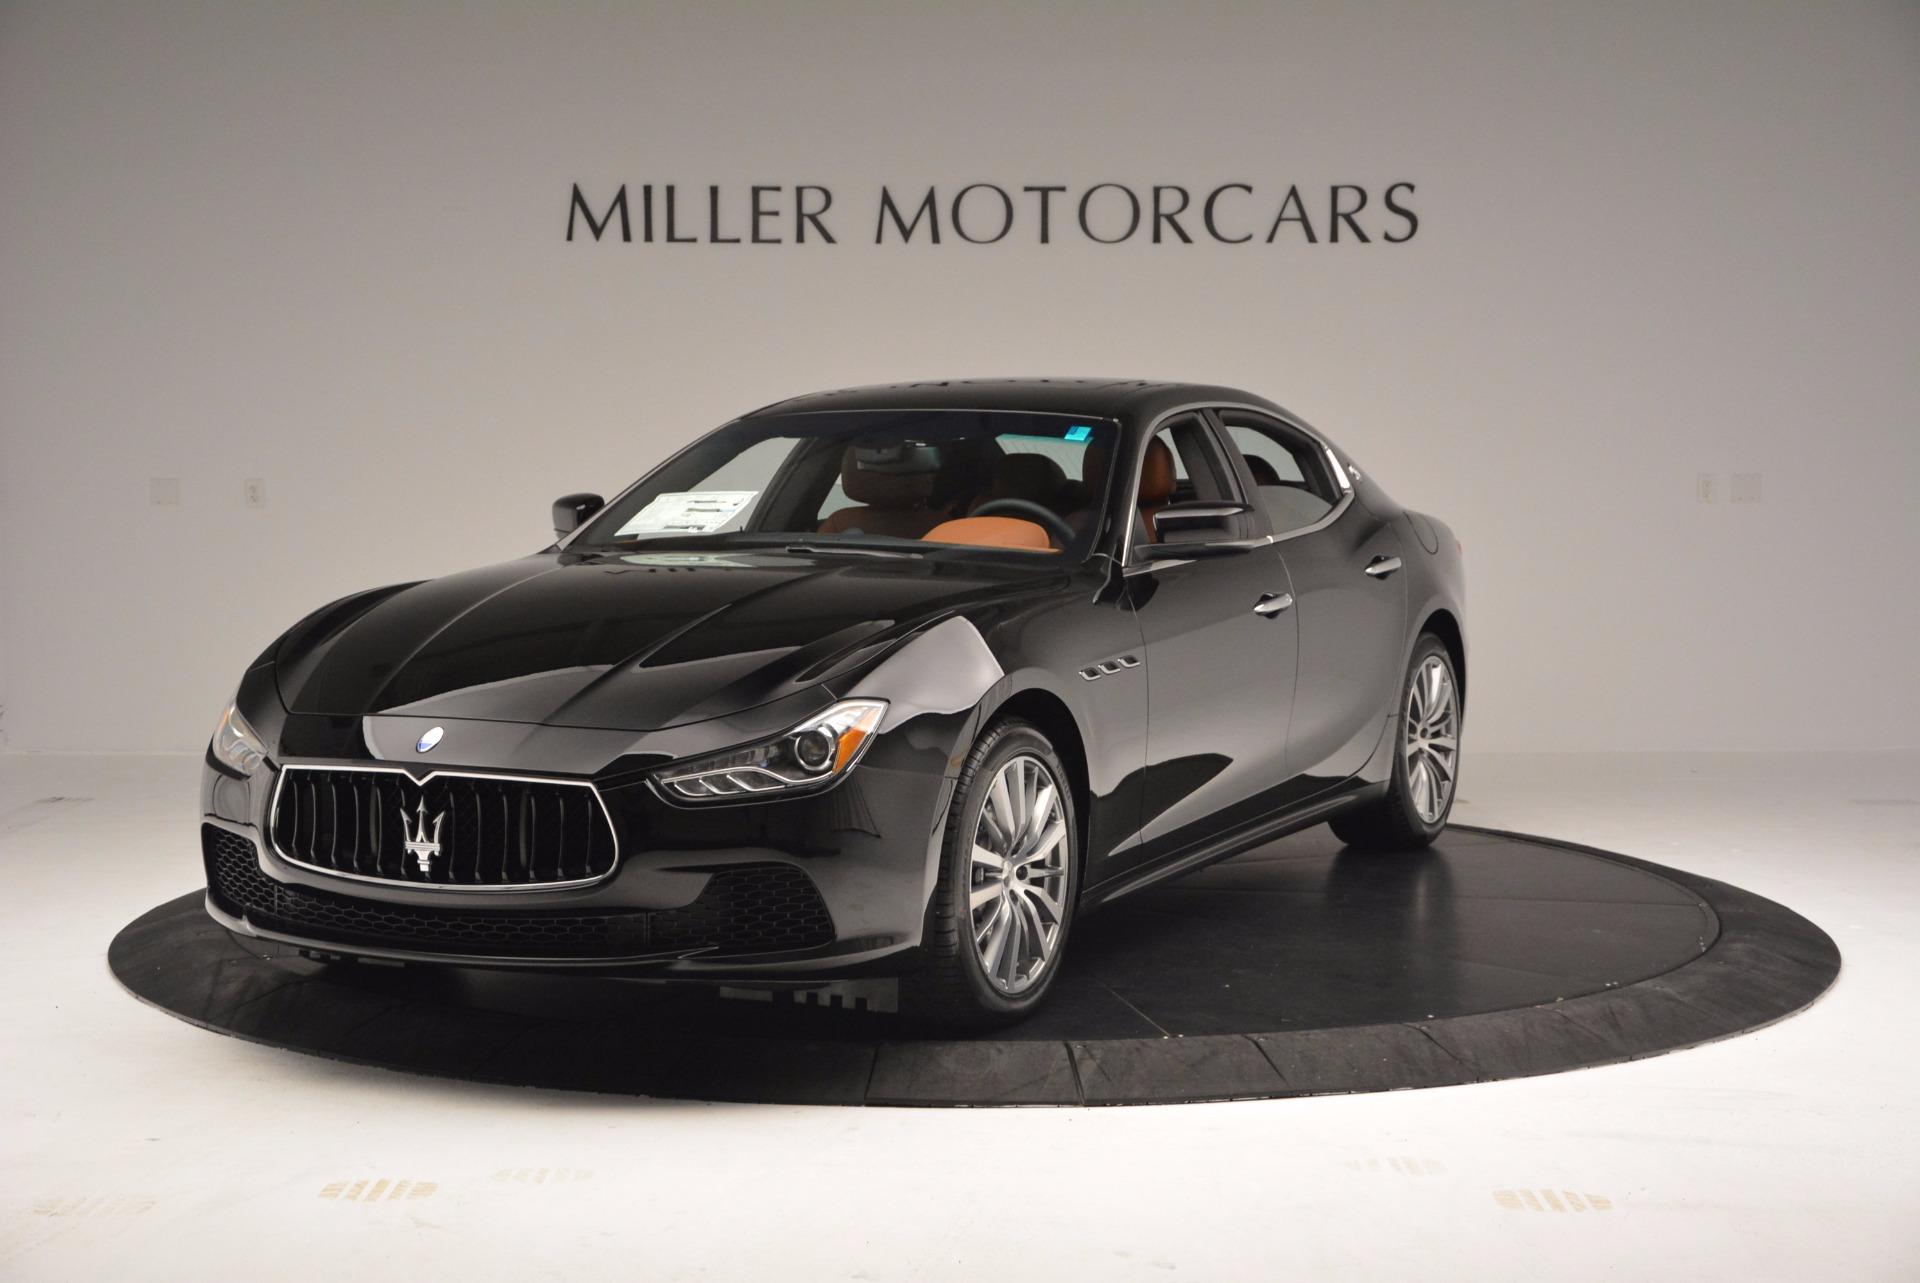 New 2017 Maserati Ghibli S Q4 EX-Loaner For Sale In Greenwich, CT 1116_main